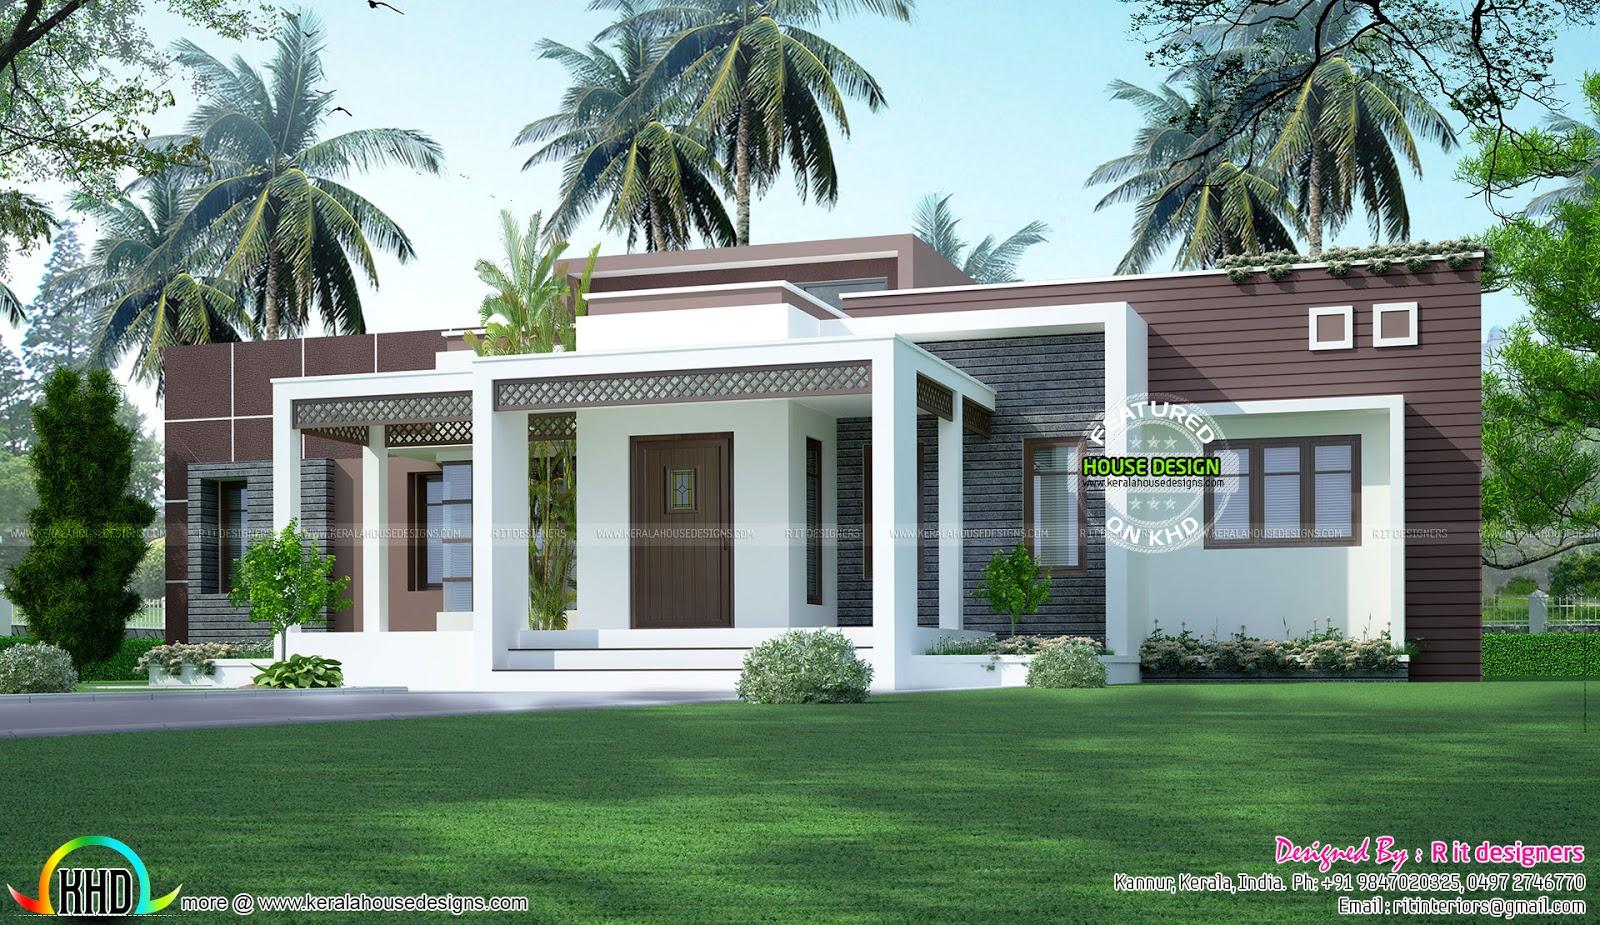 1775 Sq Ft Flat Roof One Floor Home Kerala Home Design